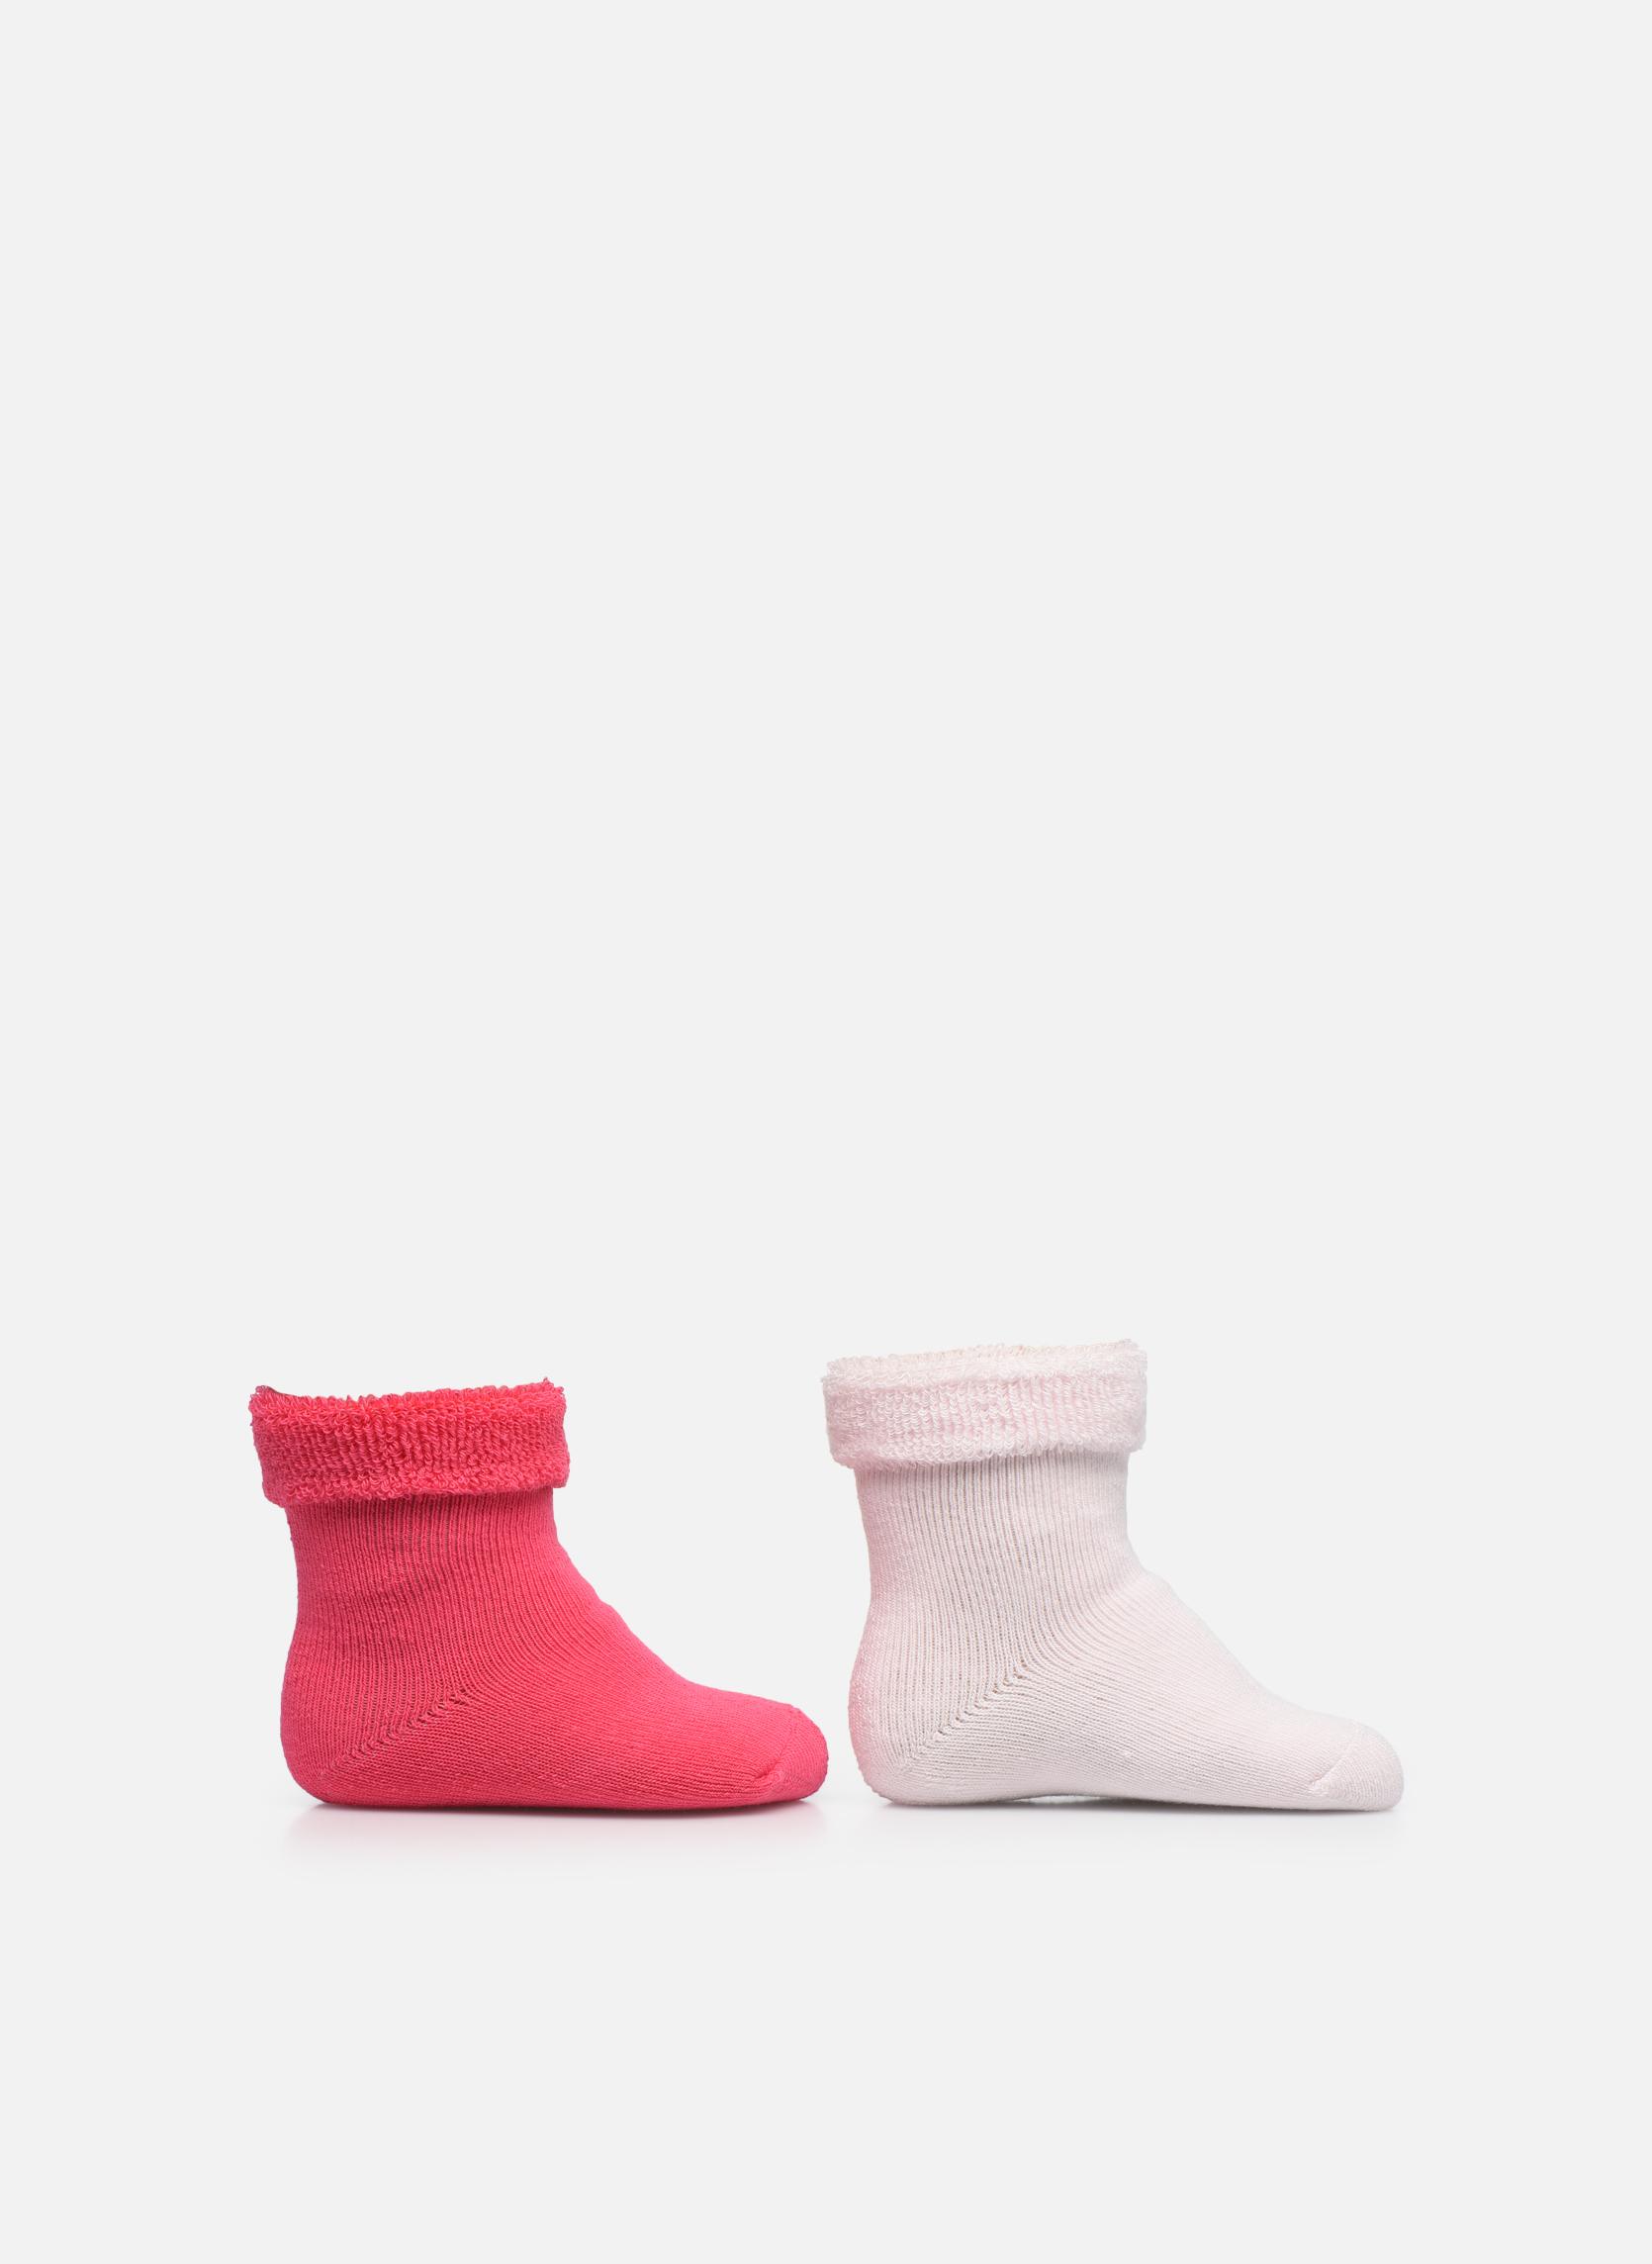 Chaussettes Baby Pack de 2 rose pale/framboise